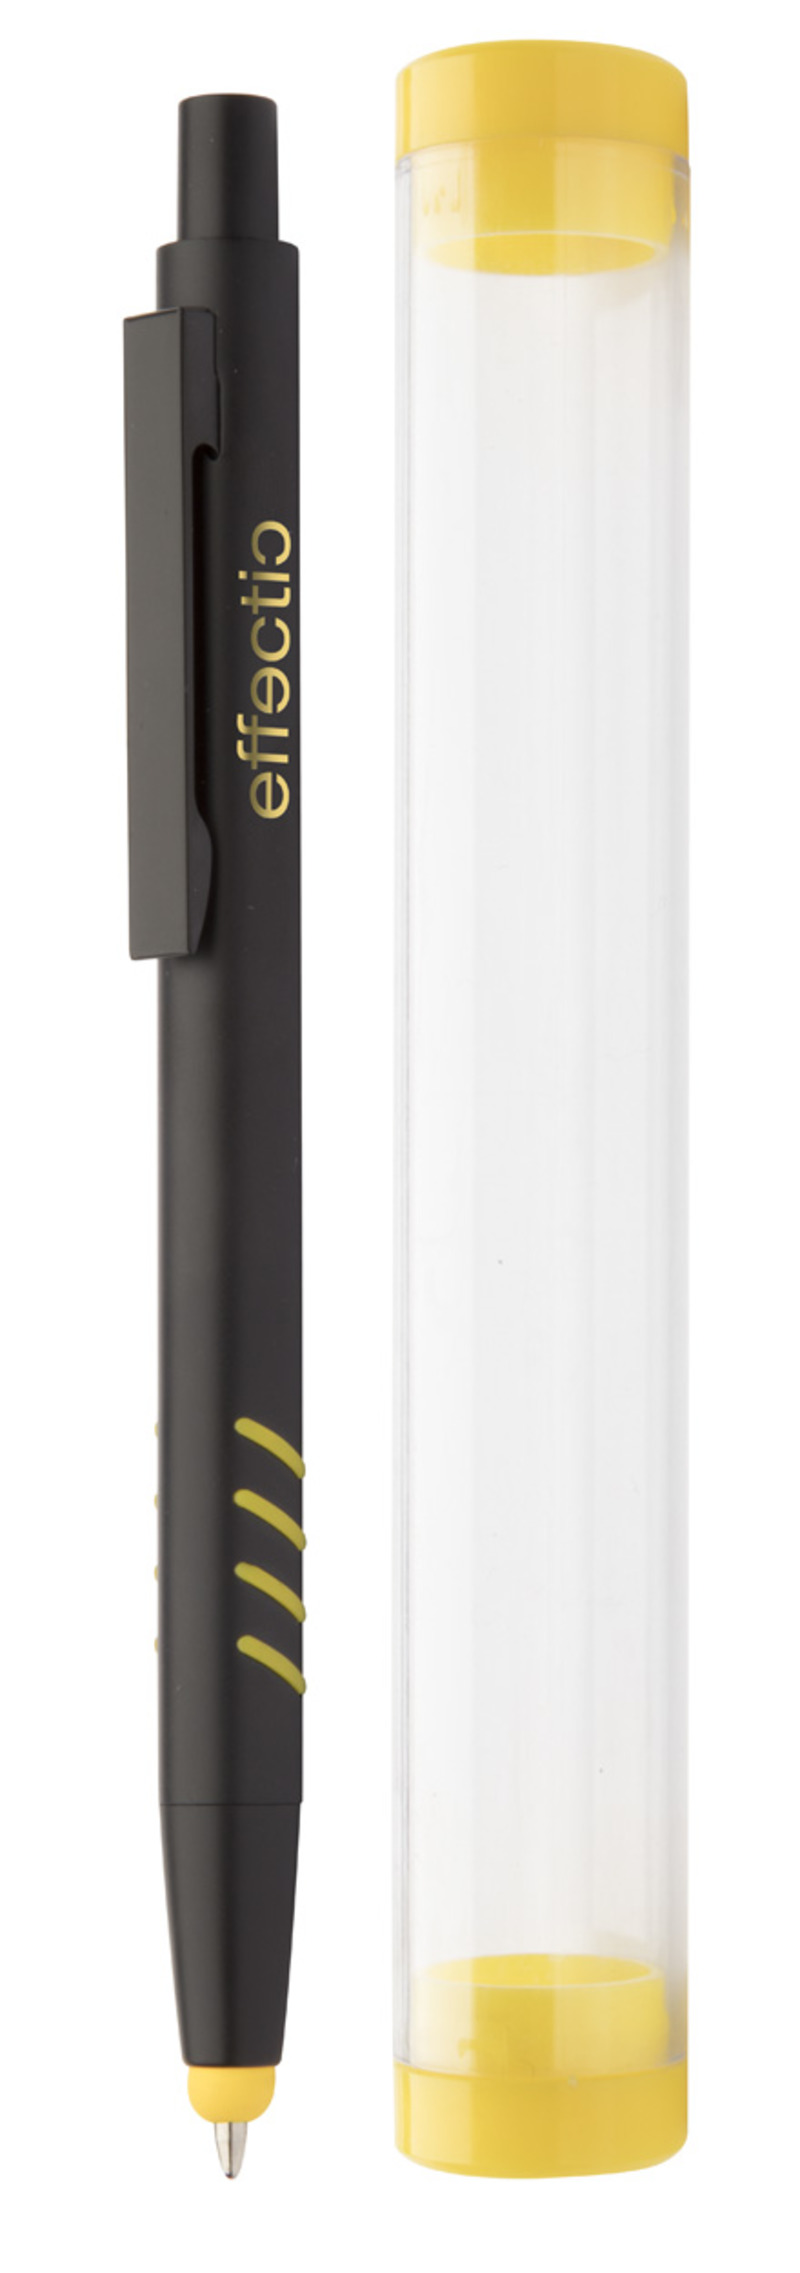 Crovy touch ballpoint pen